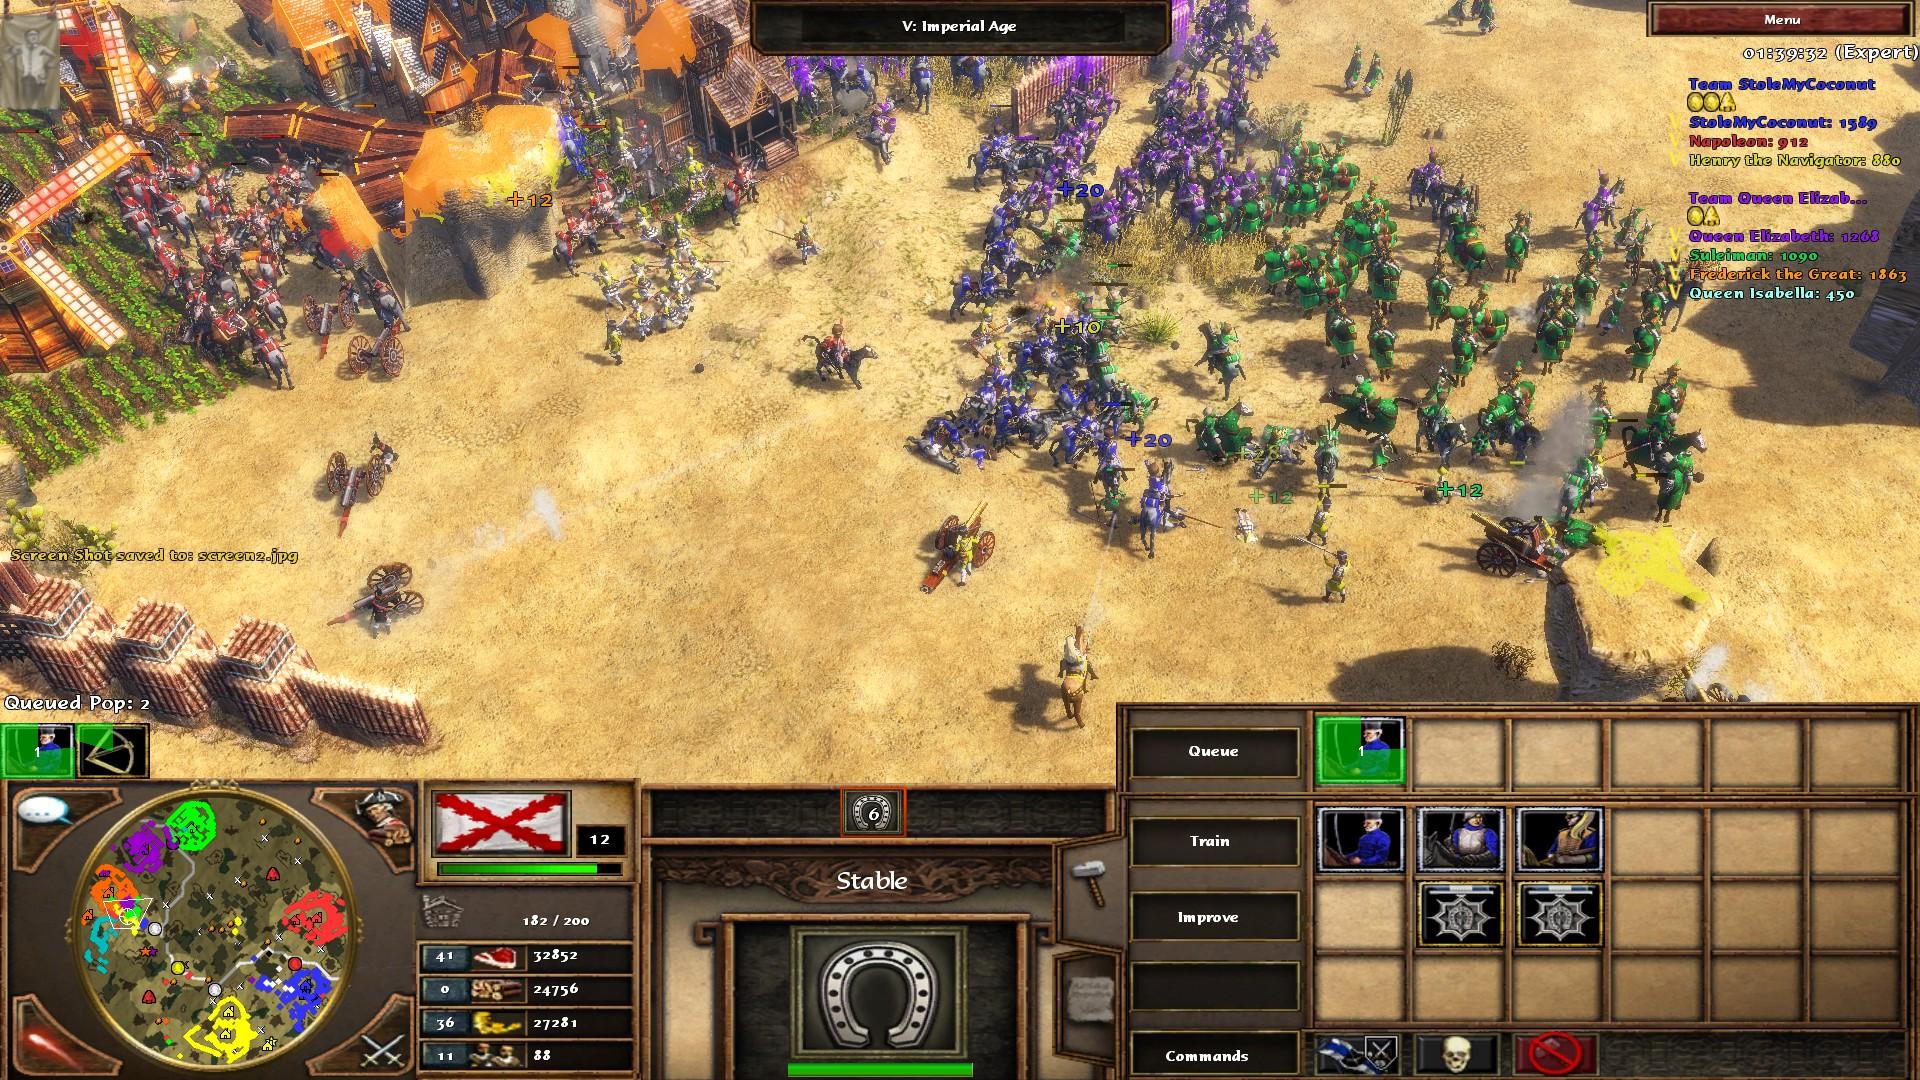 Aoe 3 multiplayer hack